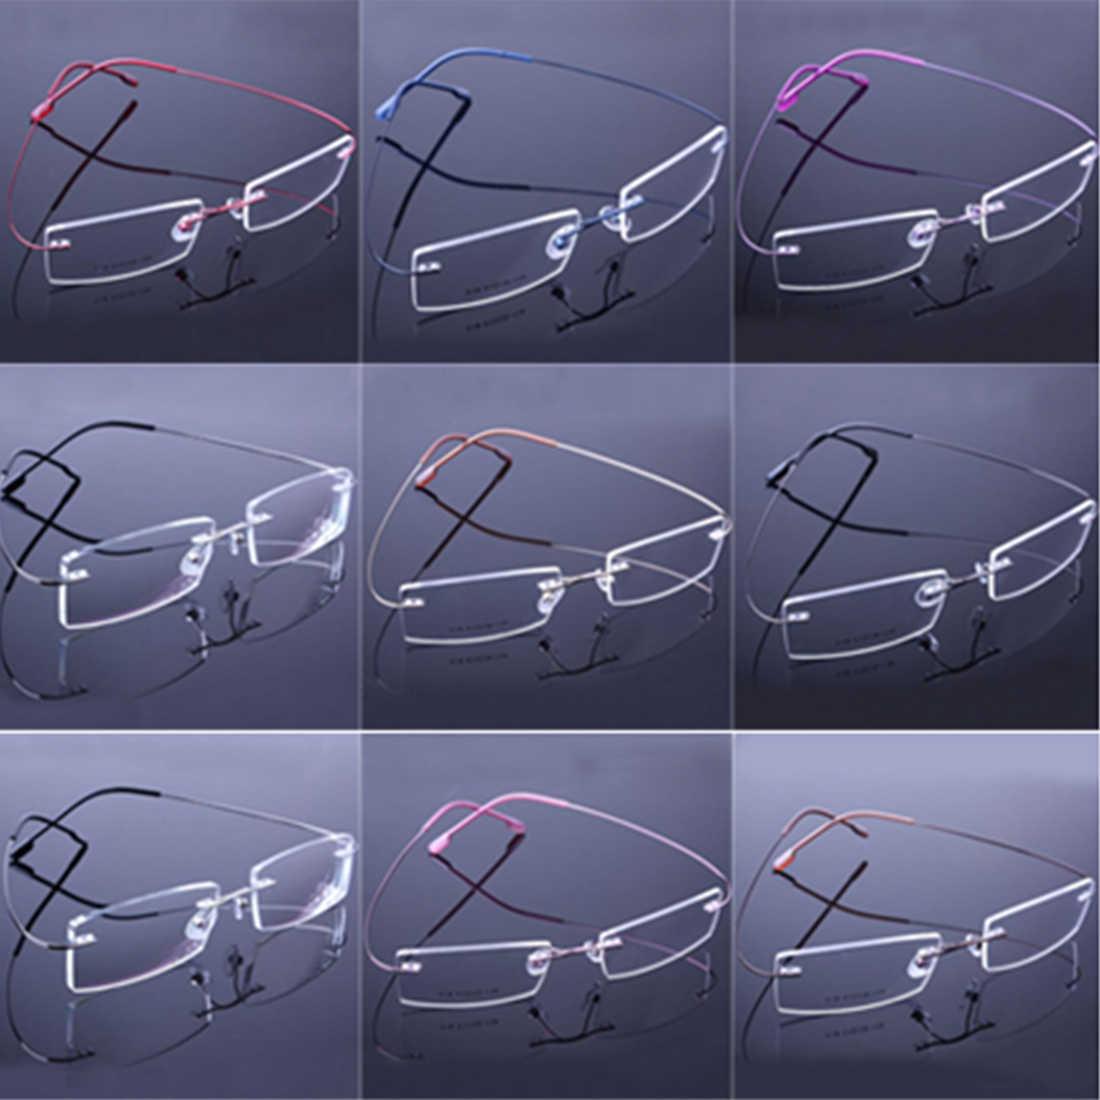 049cda1a30 ... New Retail 9 Colors Lightweight Rimless Glasses Frames Memory Titanium  Eyeglasses Spectacle Prescription Optical Frames ...